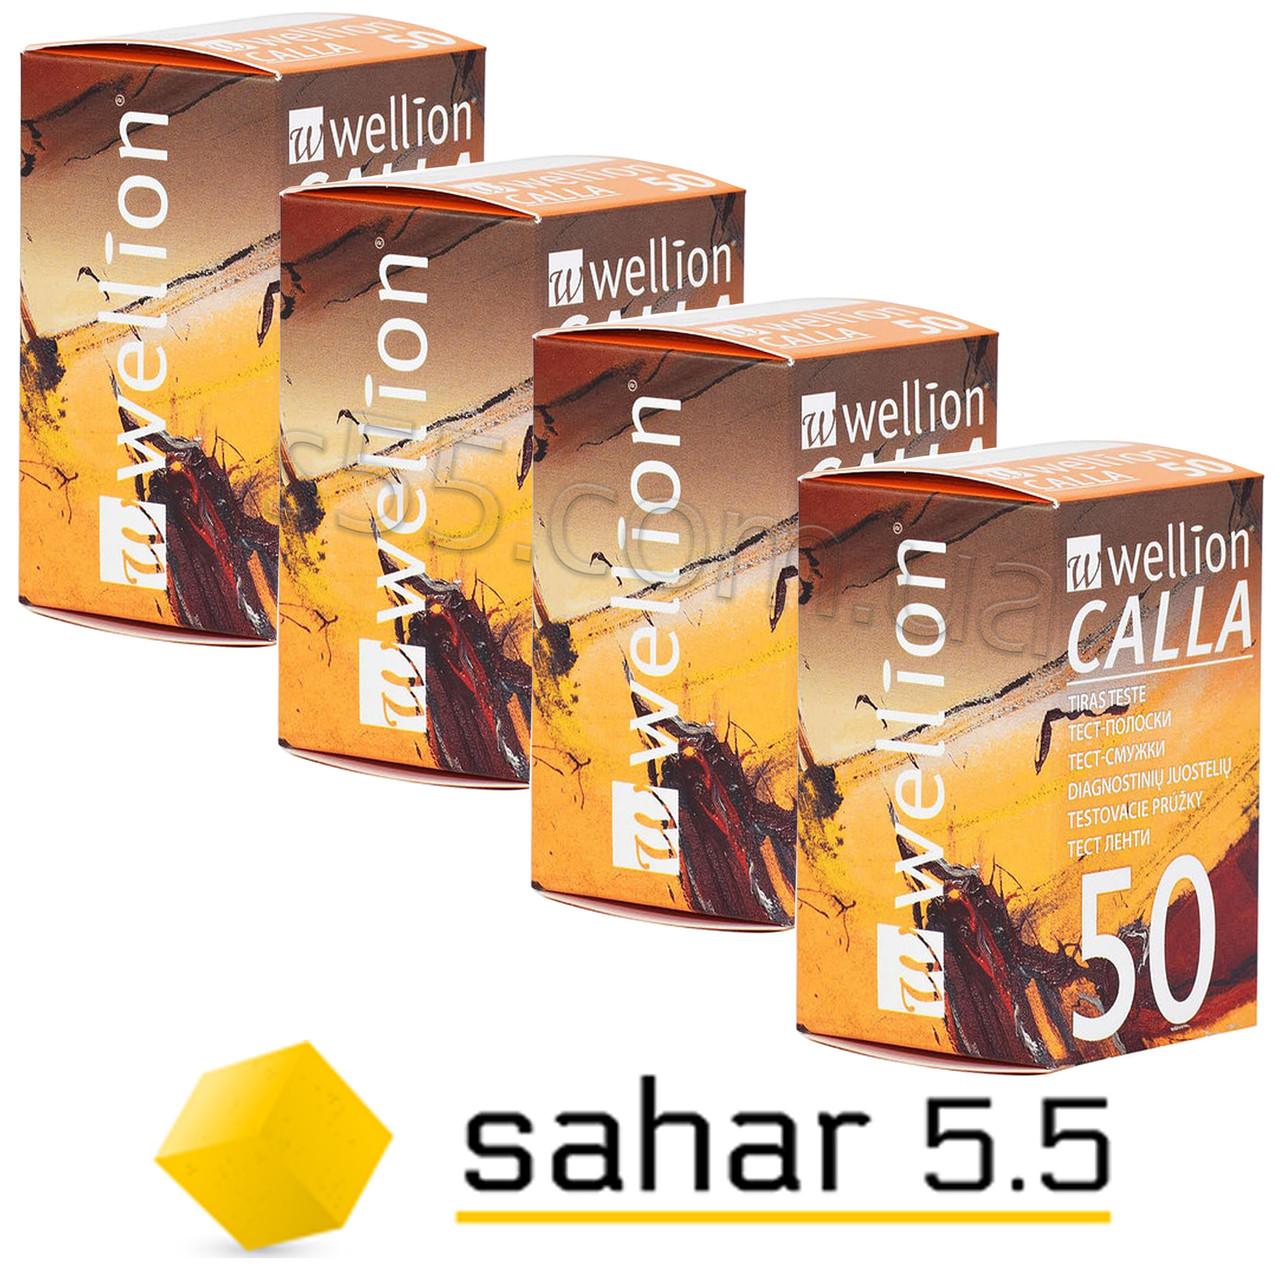 Тест полоски Веллион Калла 4уп. по 50шт - Wellion Calla